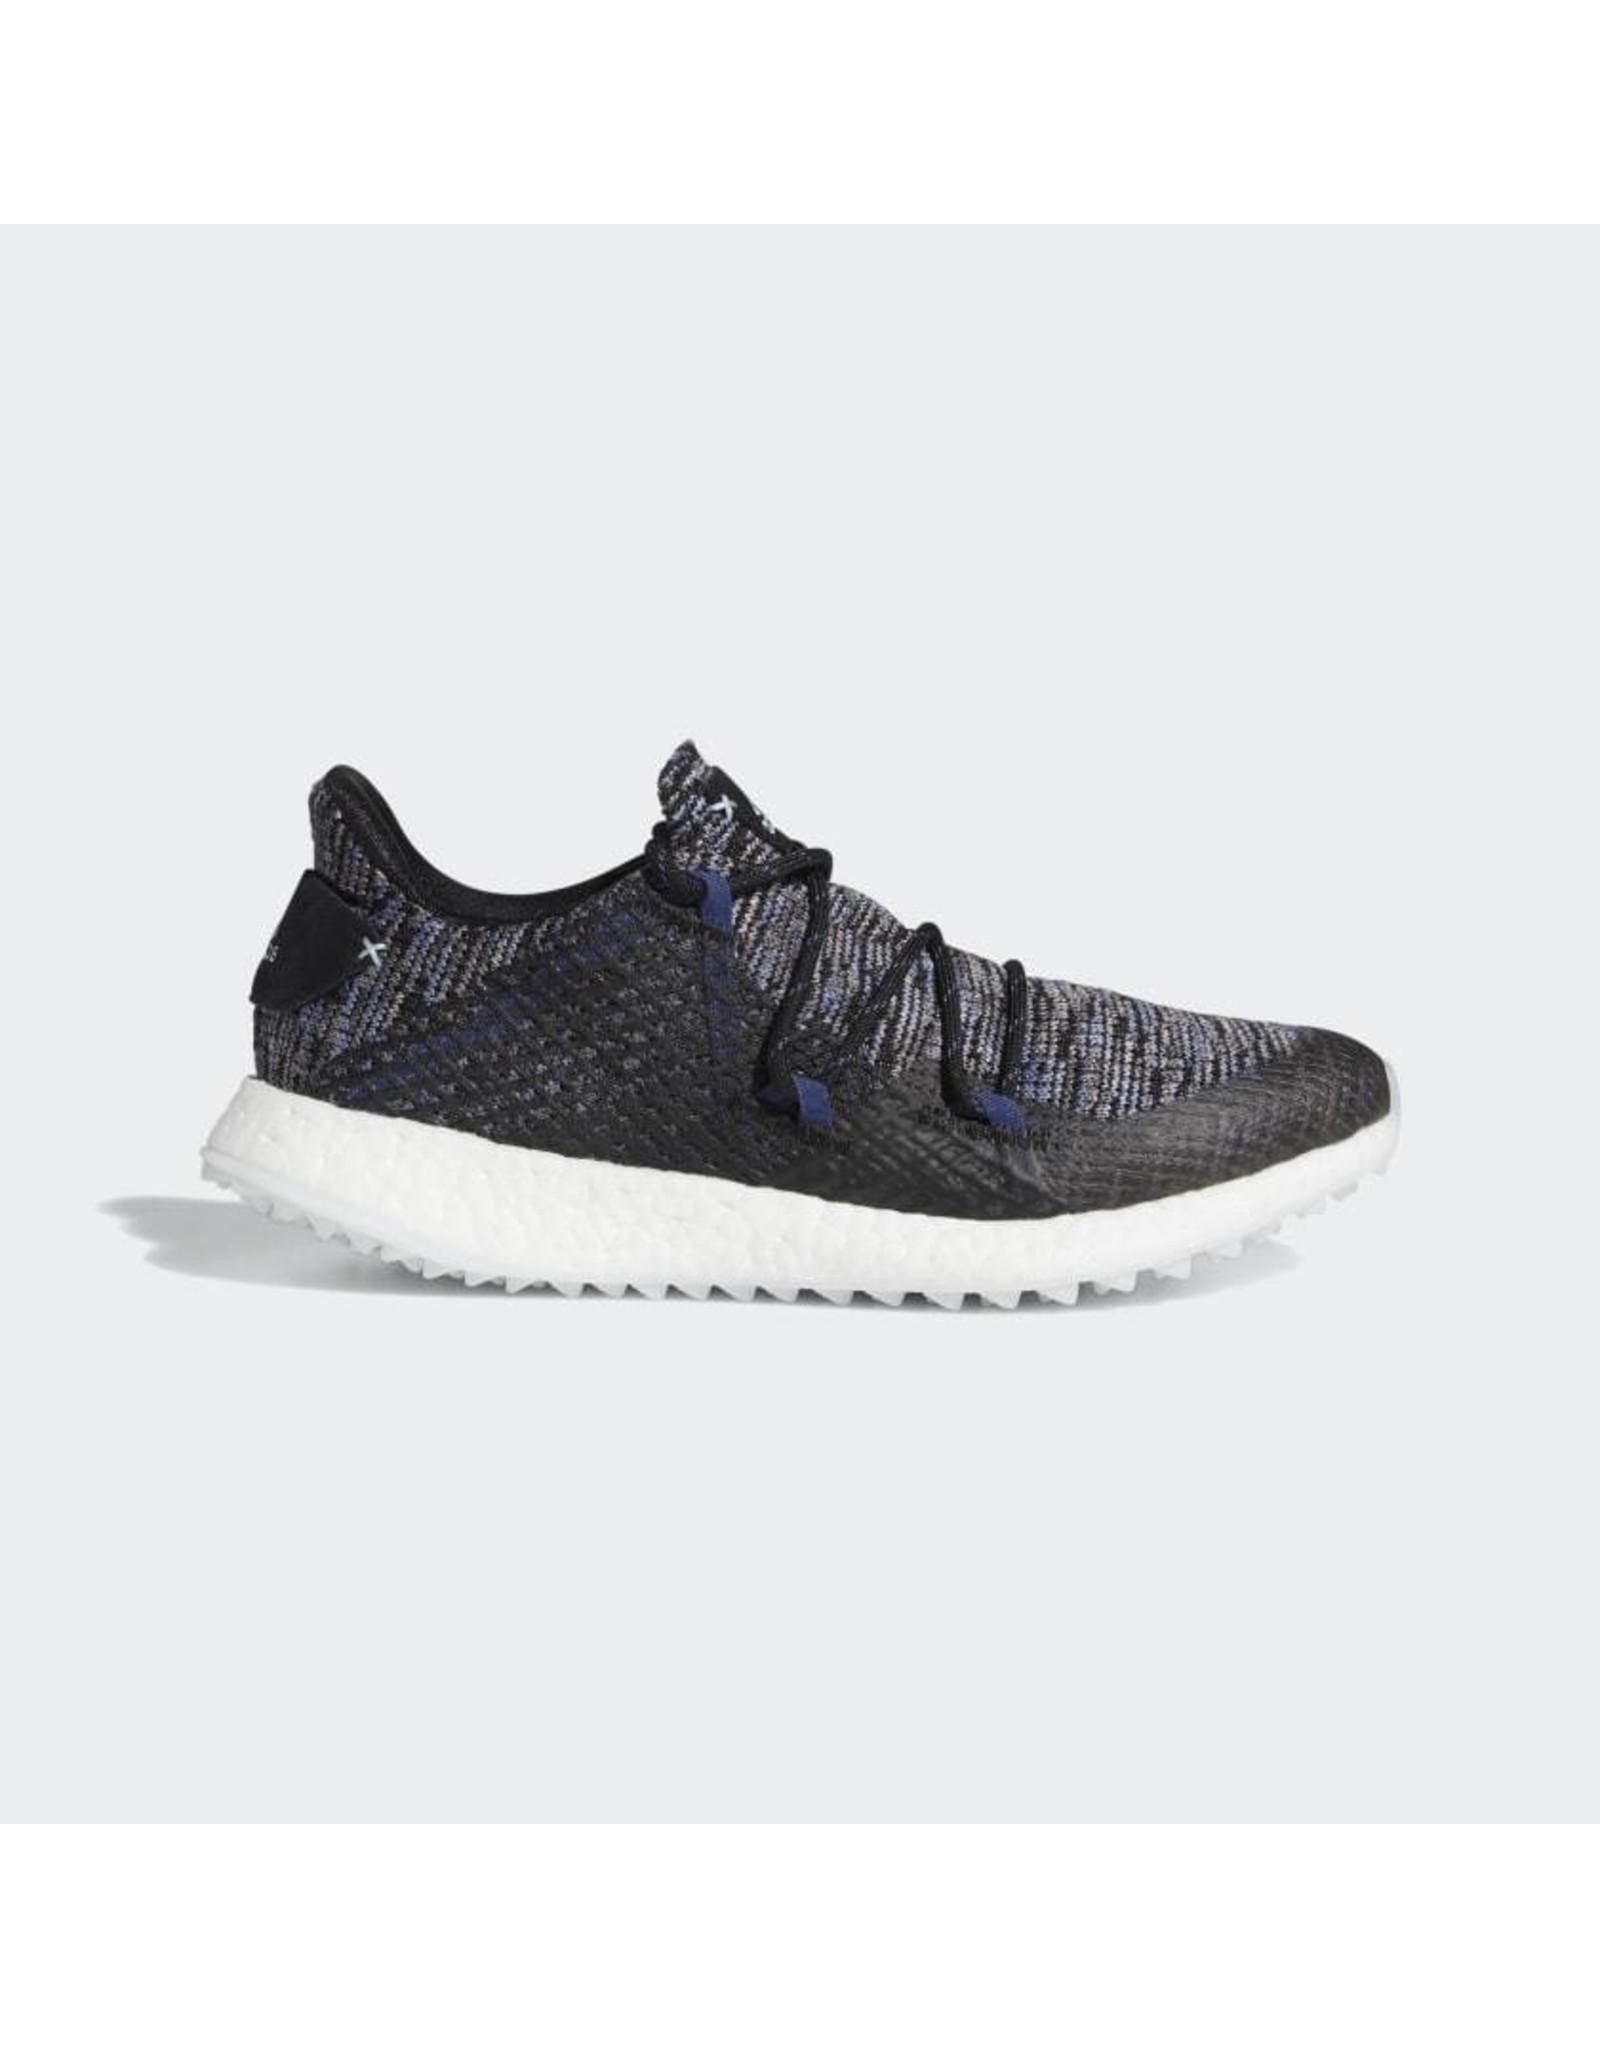 Adidas Adidas Women's Crossknit DPR Black